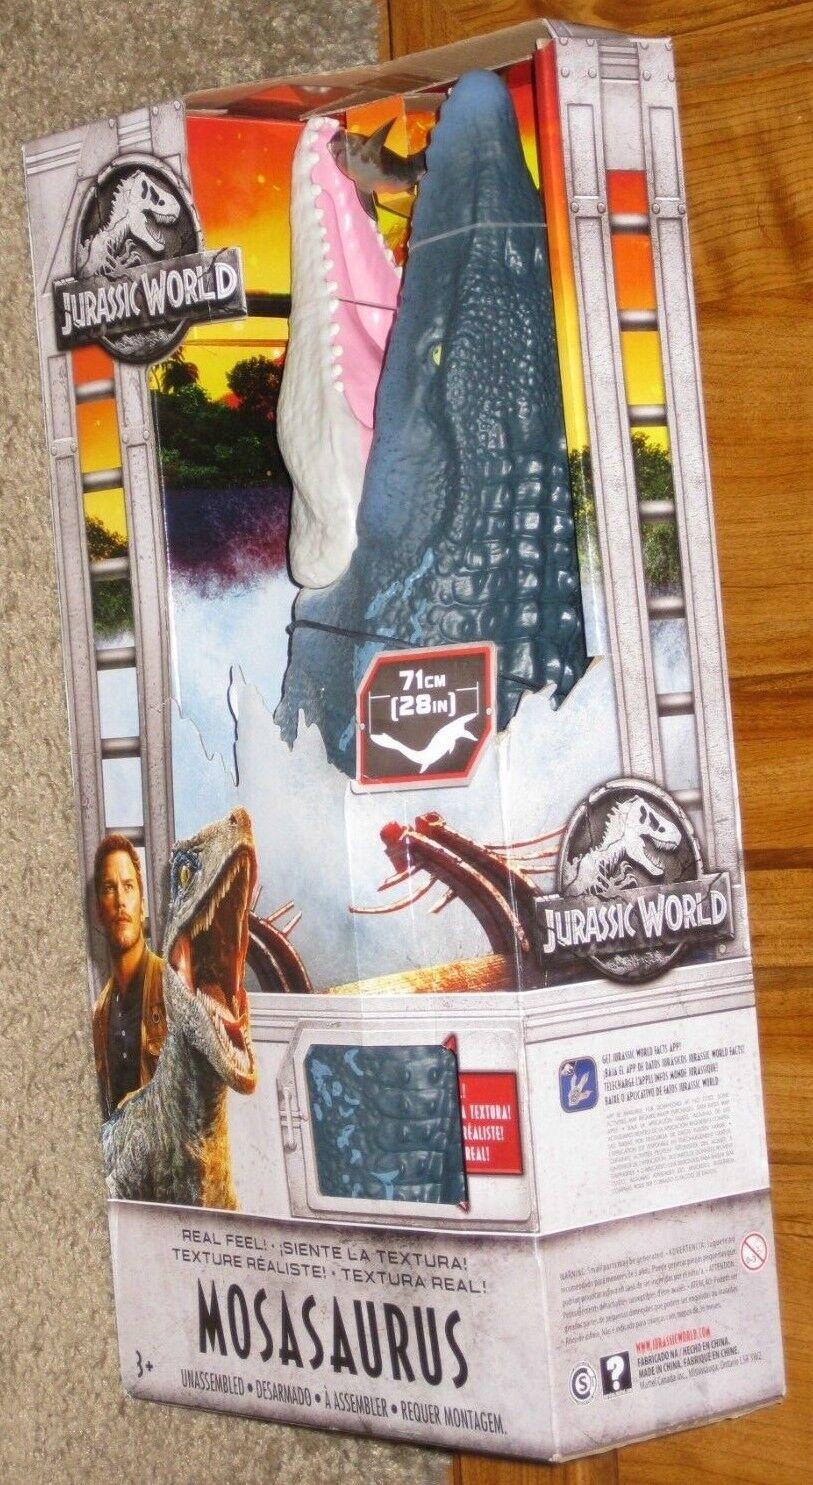 Mattel 2018 Jurassic World Fallen Kingdom Real Feel Mosasaurus 28  Action Figure